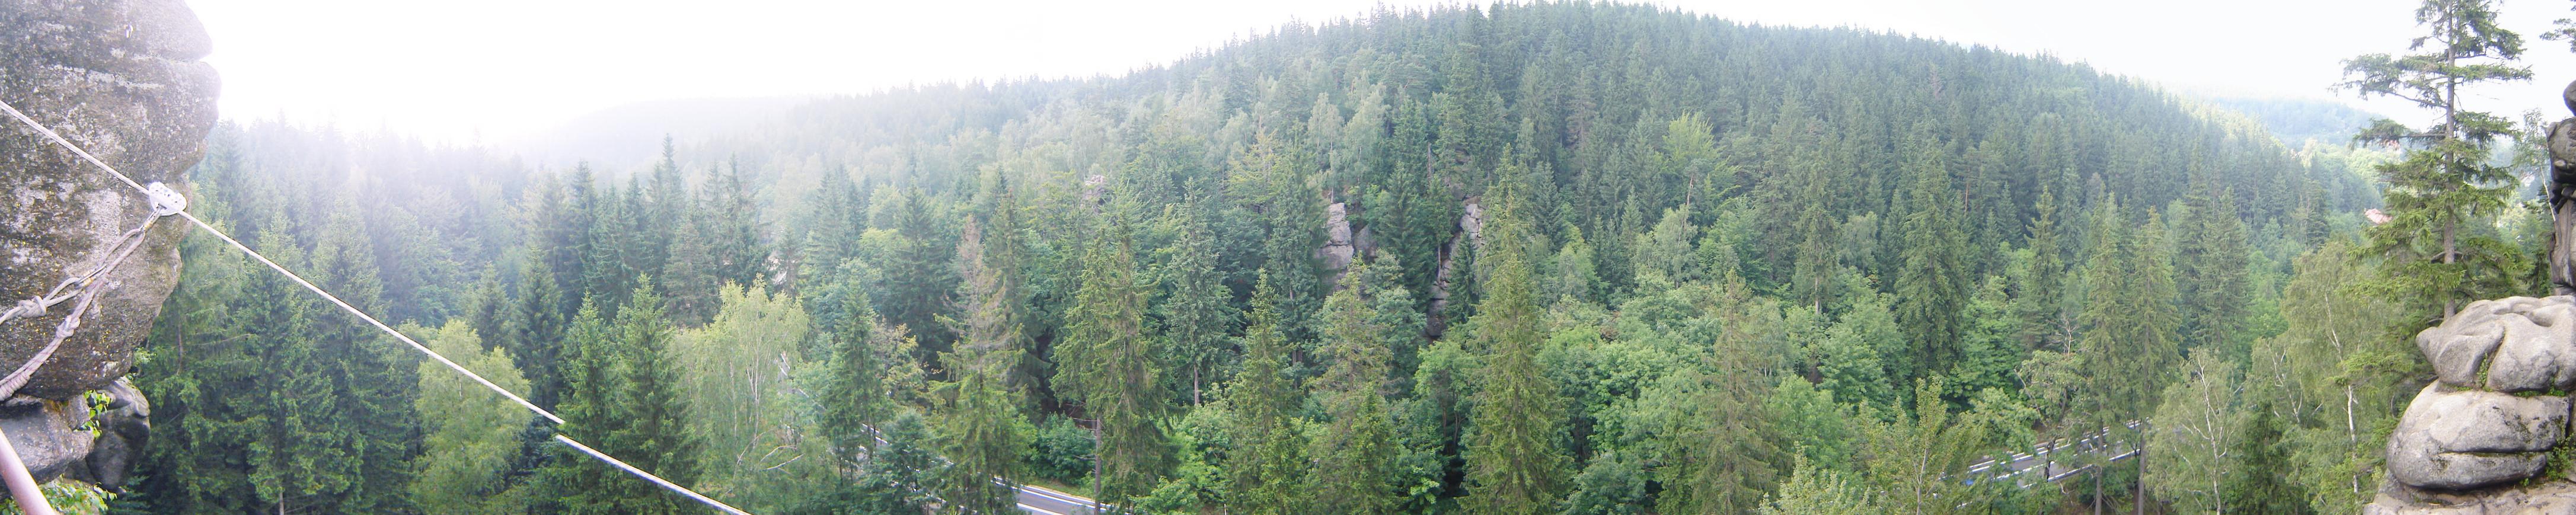 Mountain Panorama Poland 6 by dziadek1990